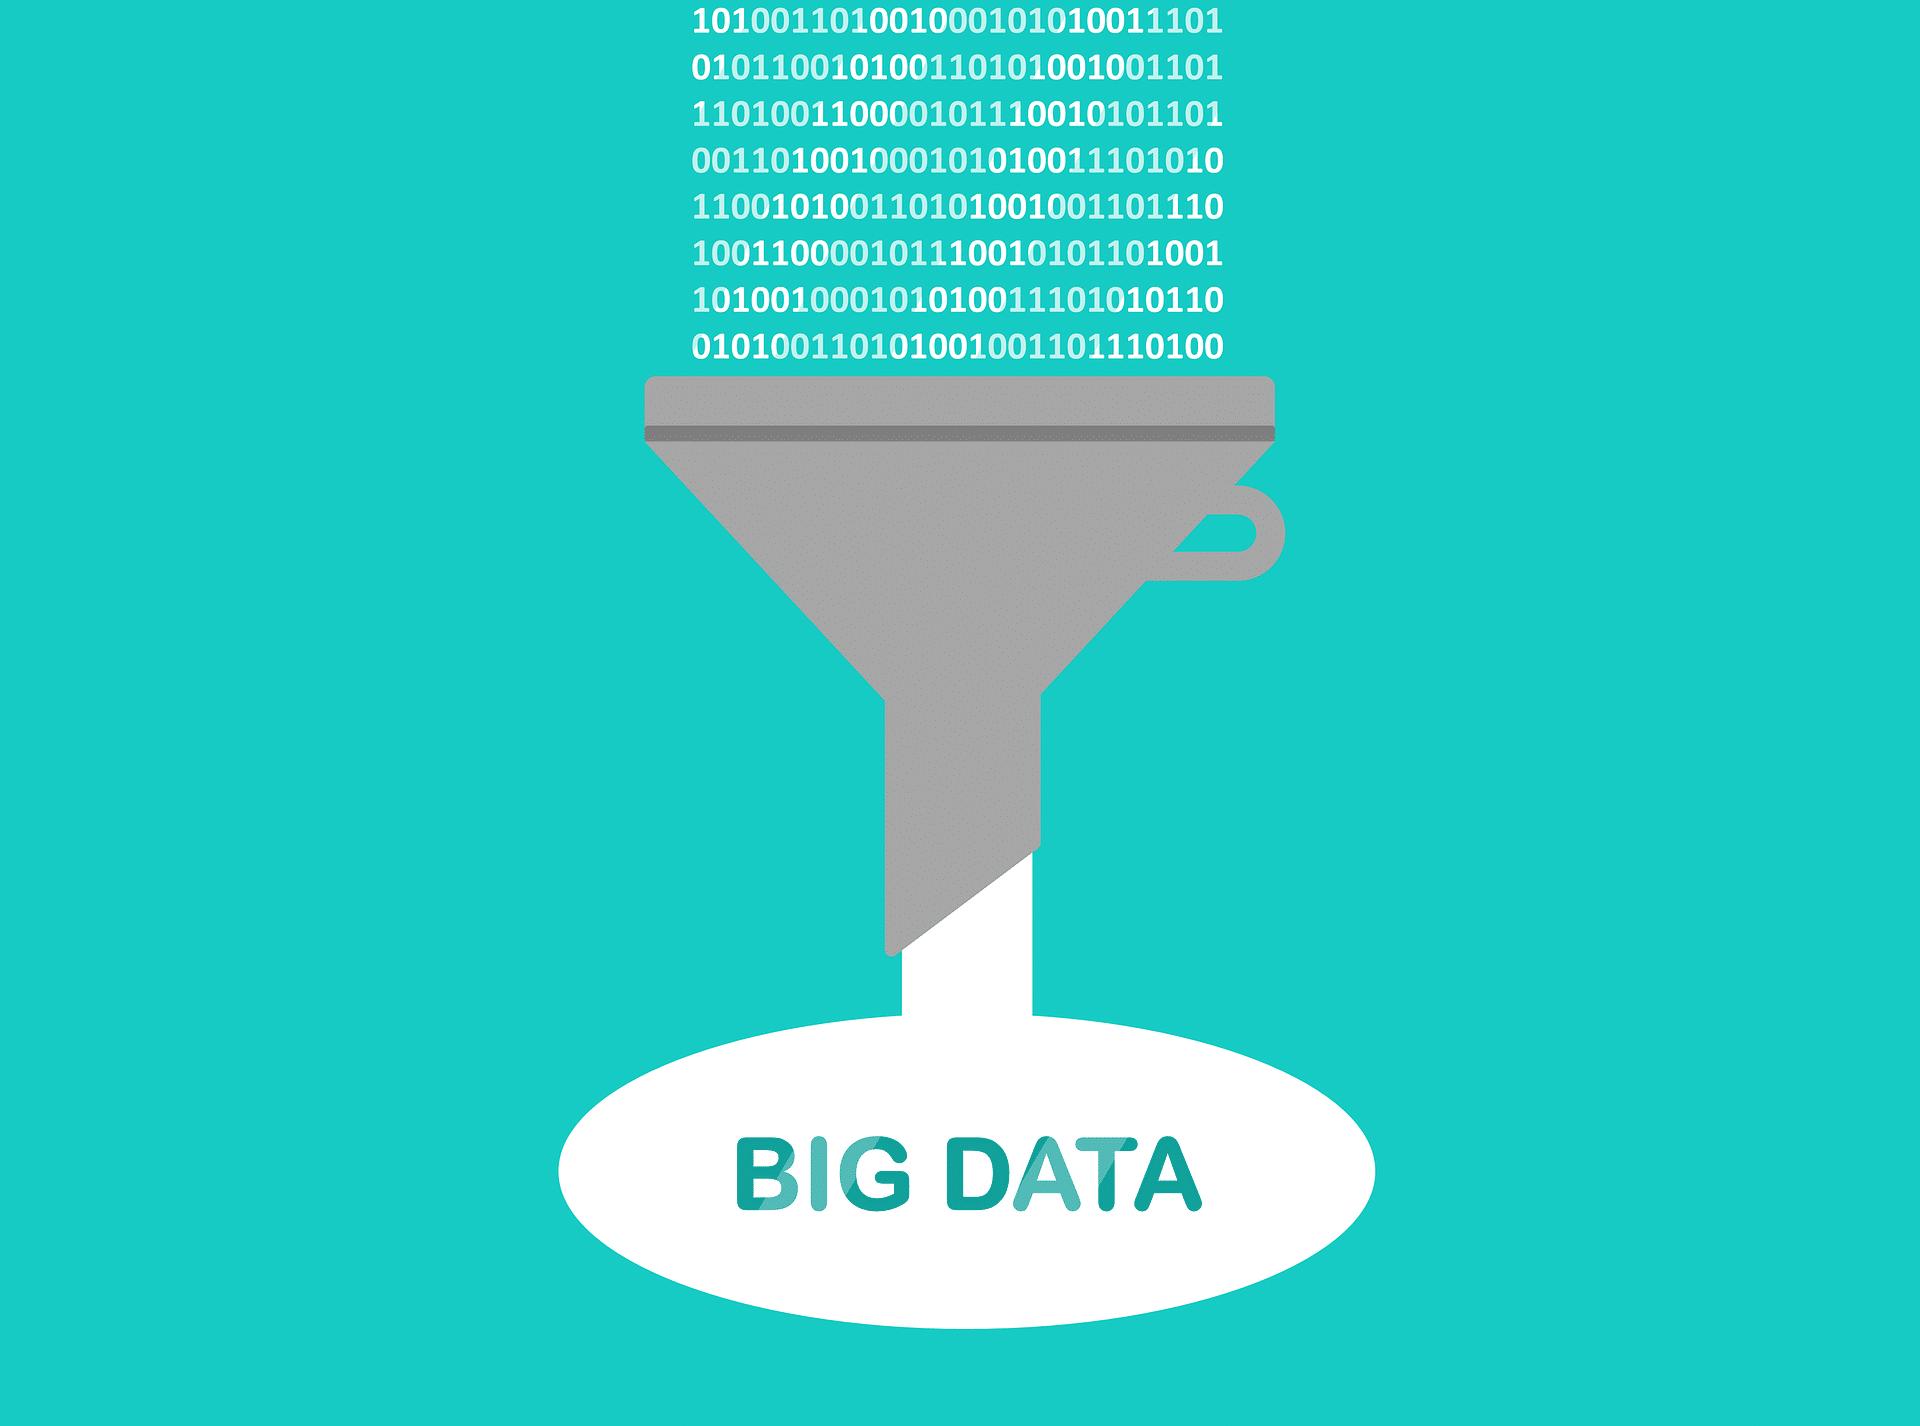 big data 3338320 1920